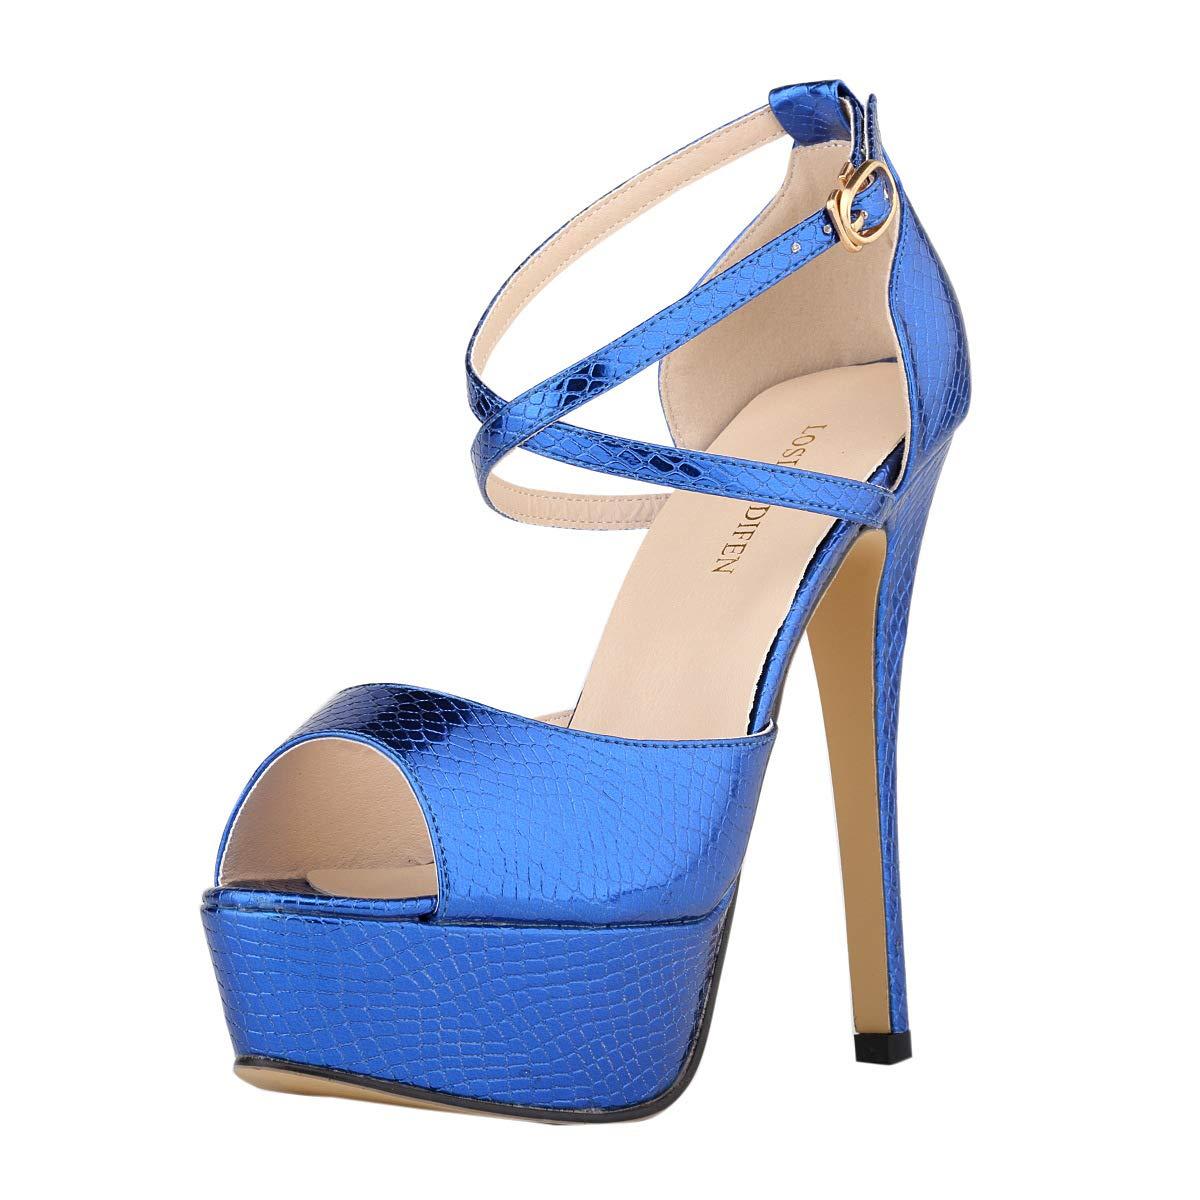 bluee Women's Peep Toe Platform Stiletto High Heel Ankle Crisscross Strap Buckle Snap Dress Party Heeled Sandals